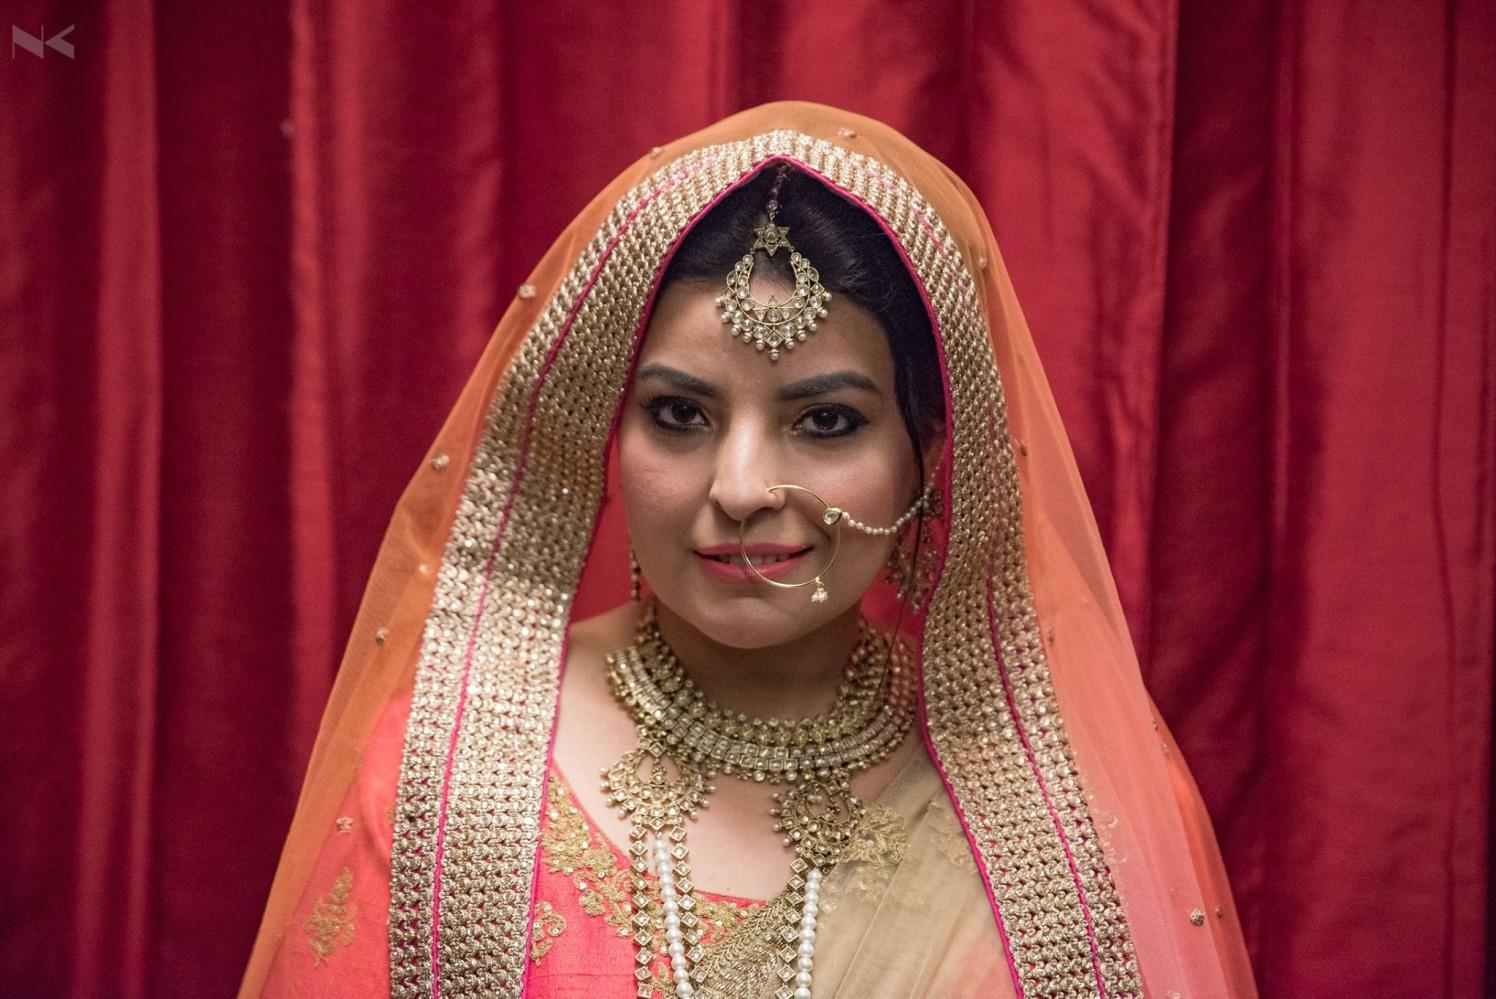 Bridal Portrait by Nikhil Kumar Bridal-makeup Bridal-jewellery-and-accessories | Weddings Photos & Ideas